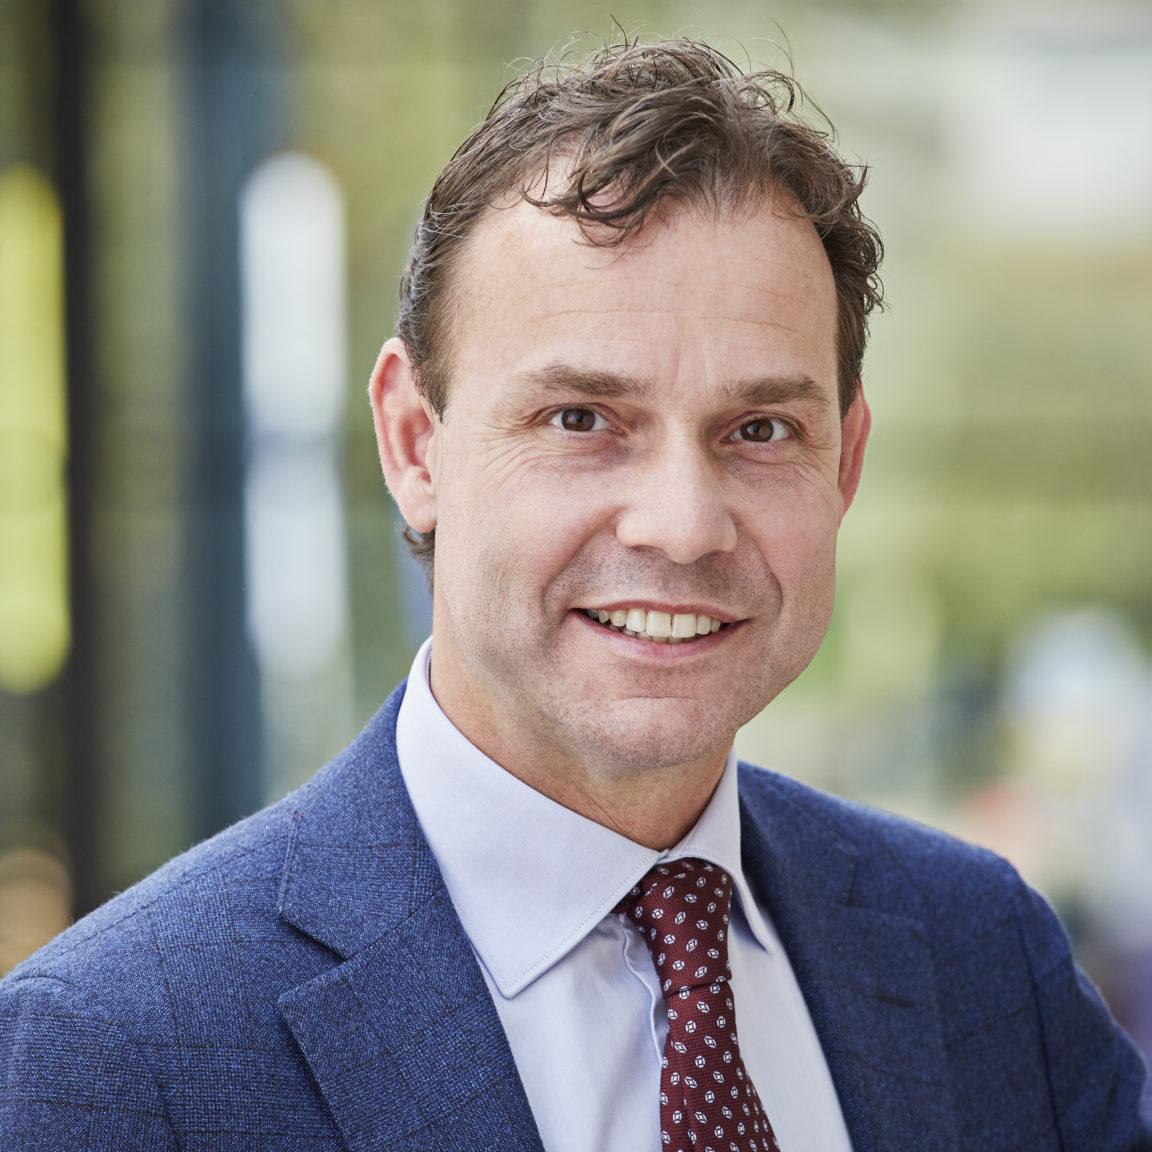 Maurice van den Bosch